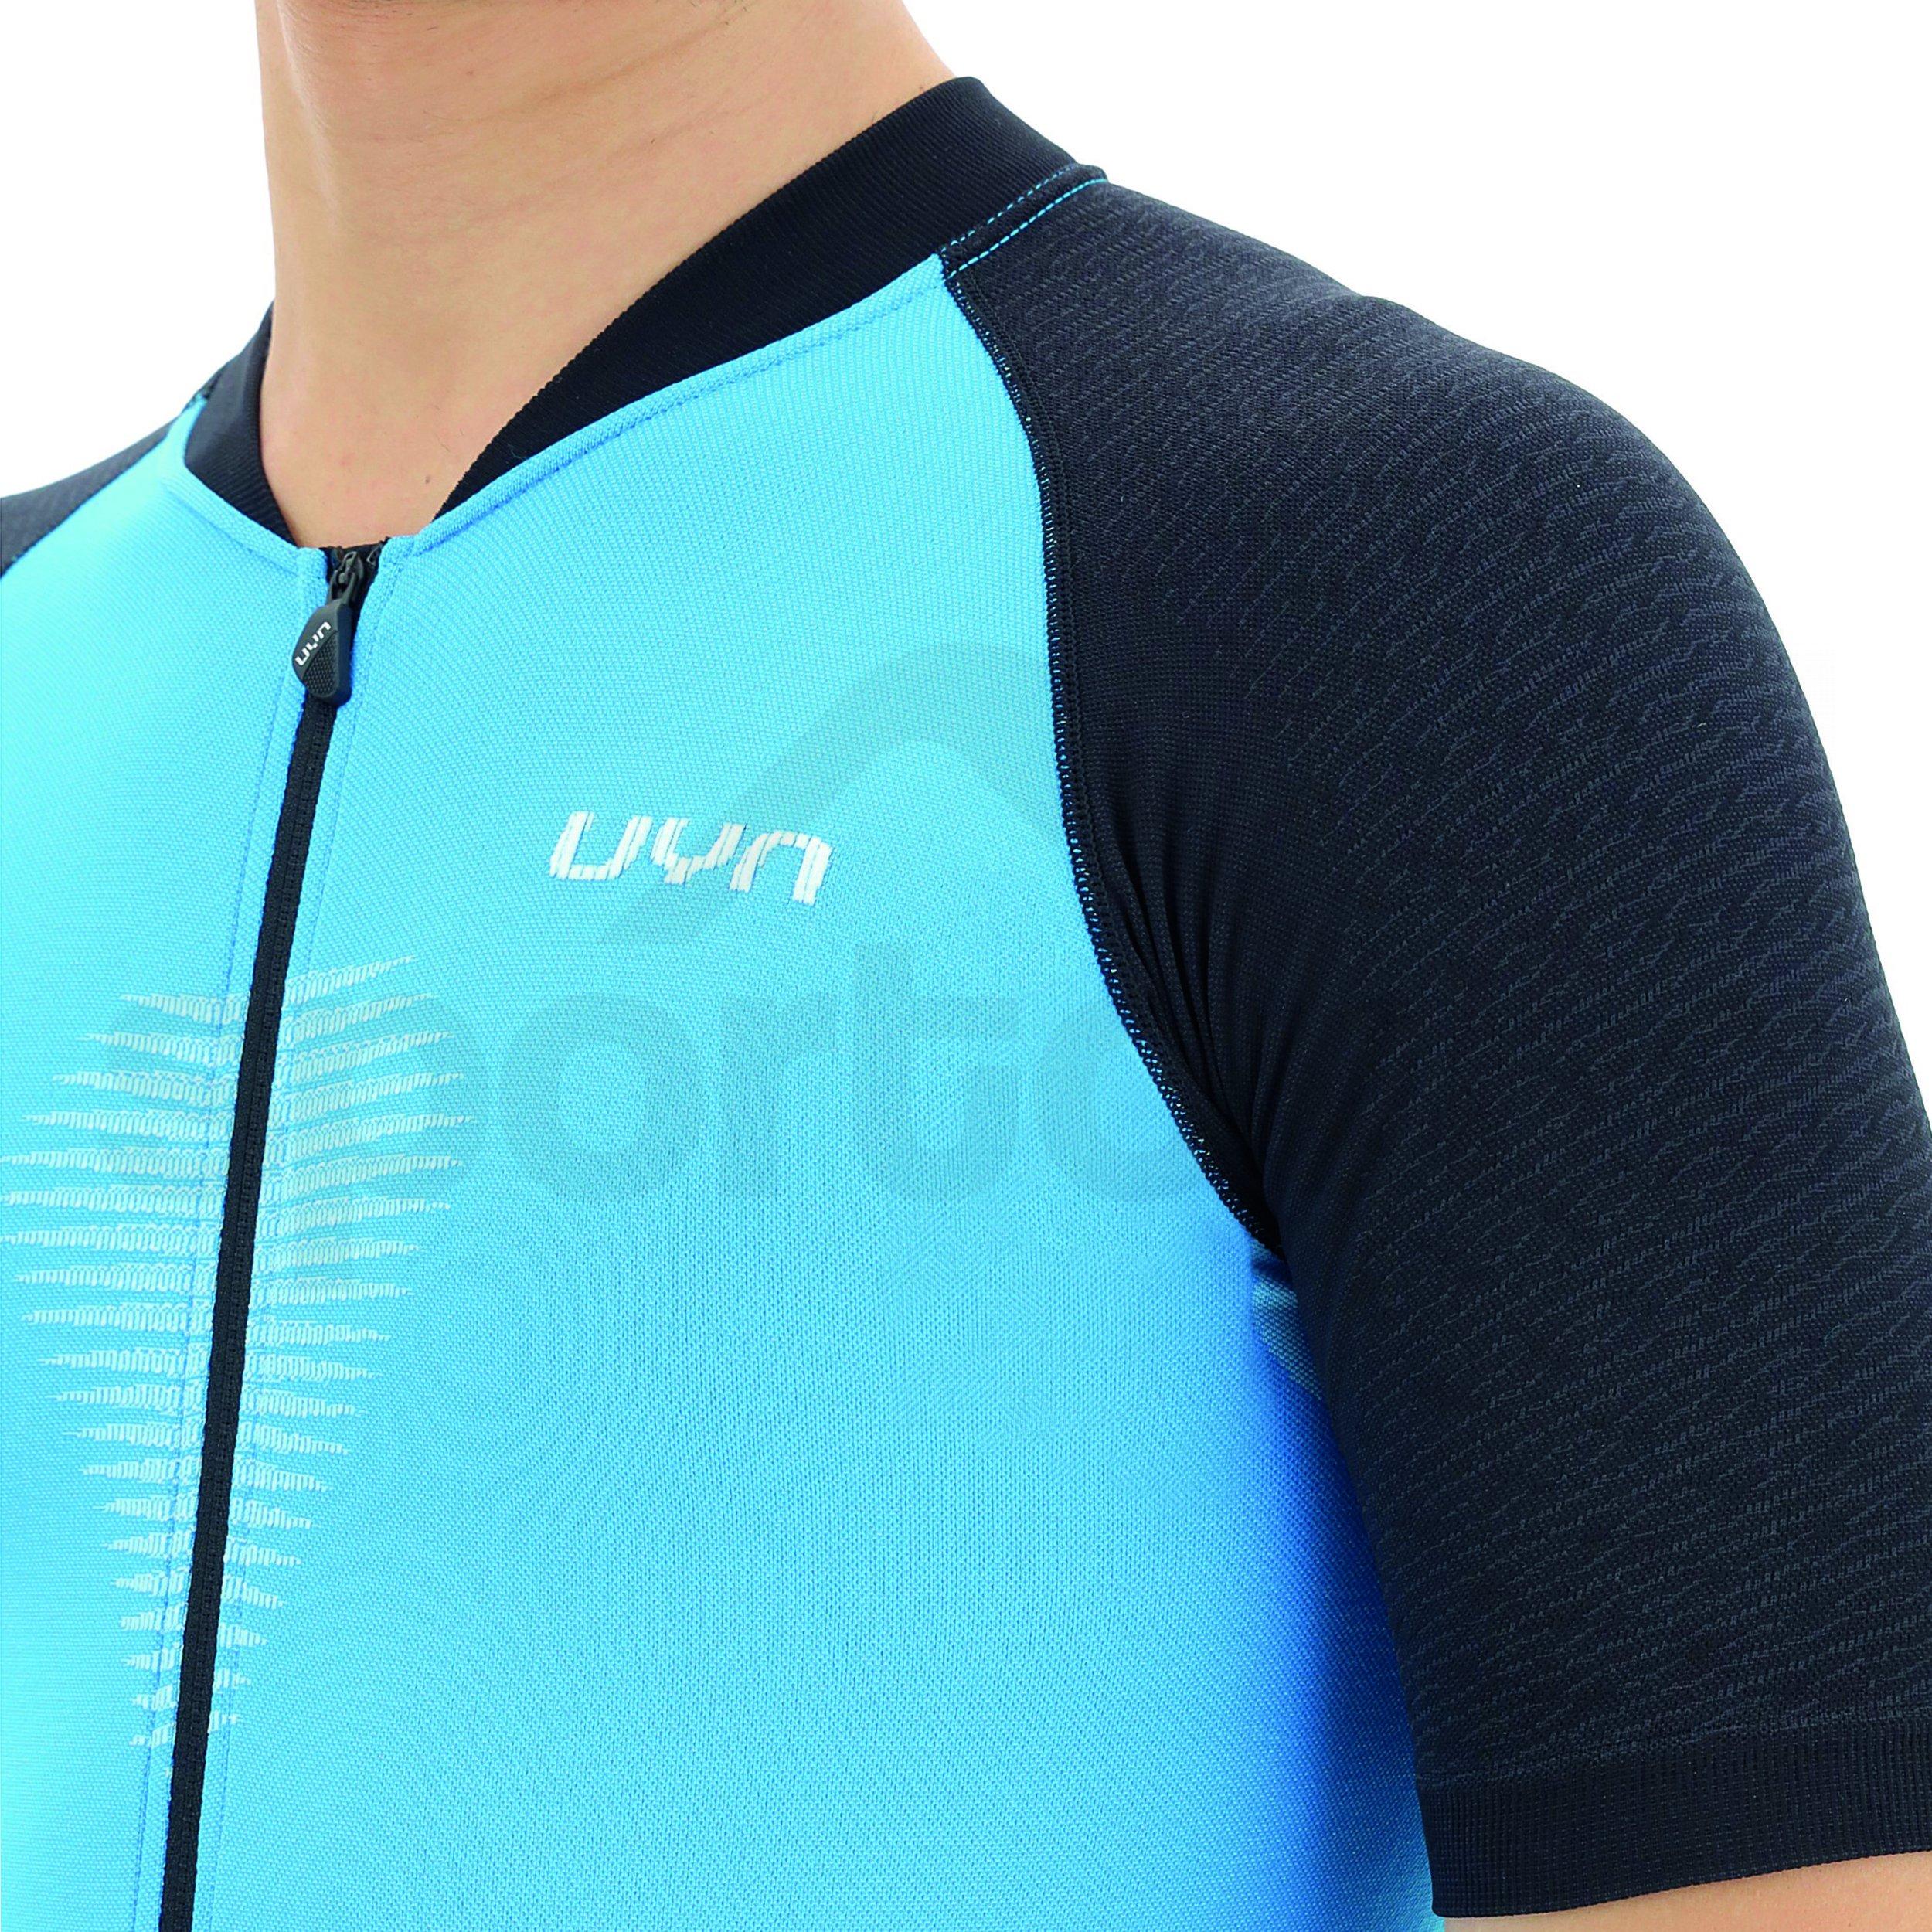 Cyklistický dres UYN Biking Grandfondo - modrá/černá